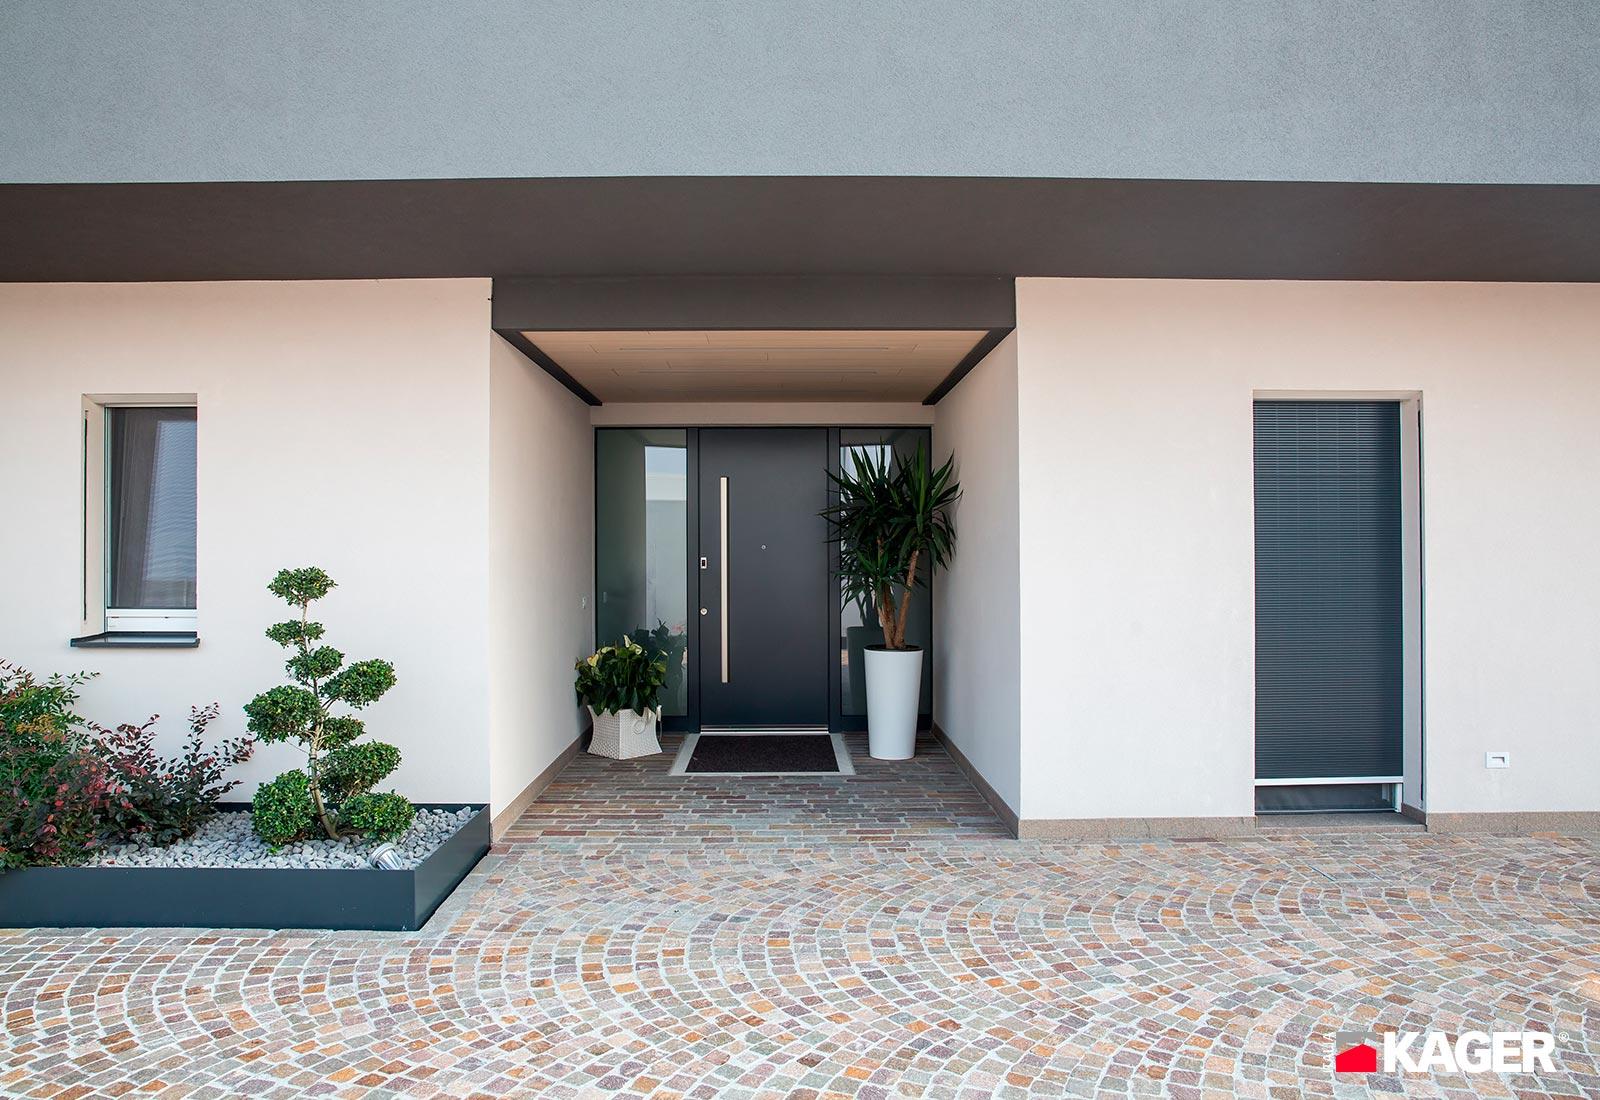 Casa-in-legno-Oppeano-Verona-Kager-Italia-15